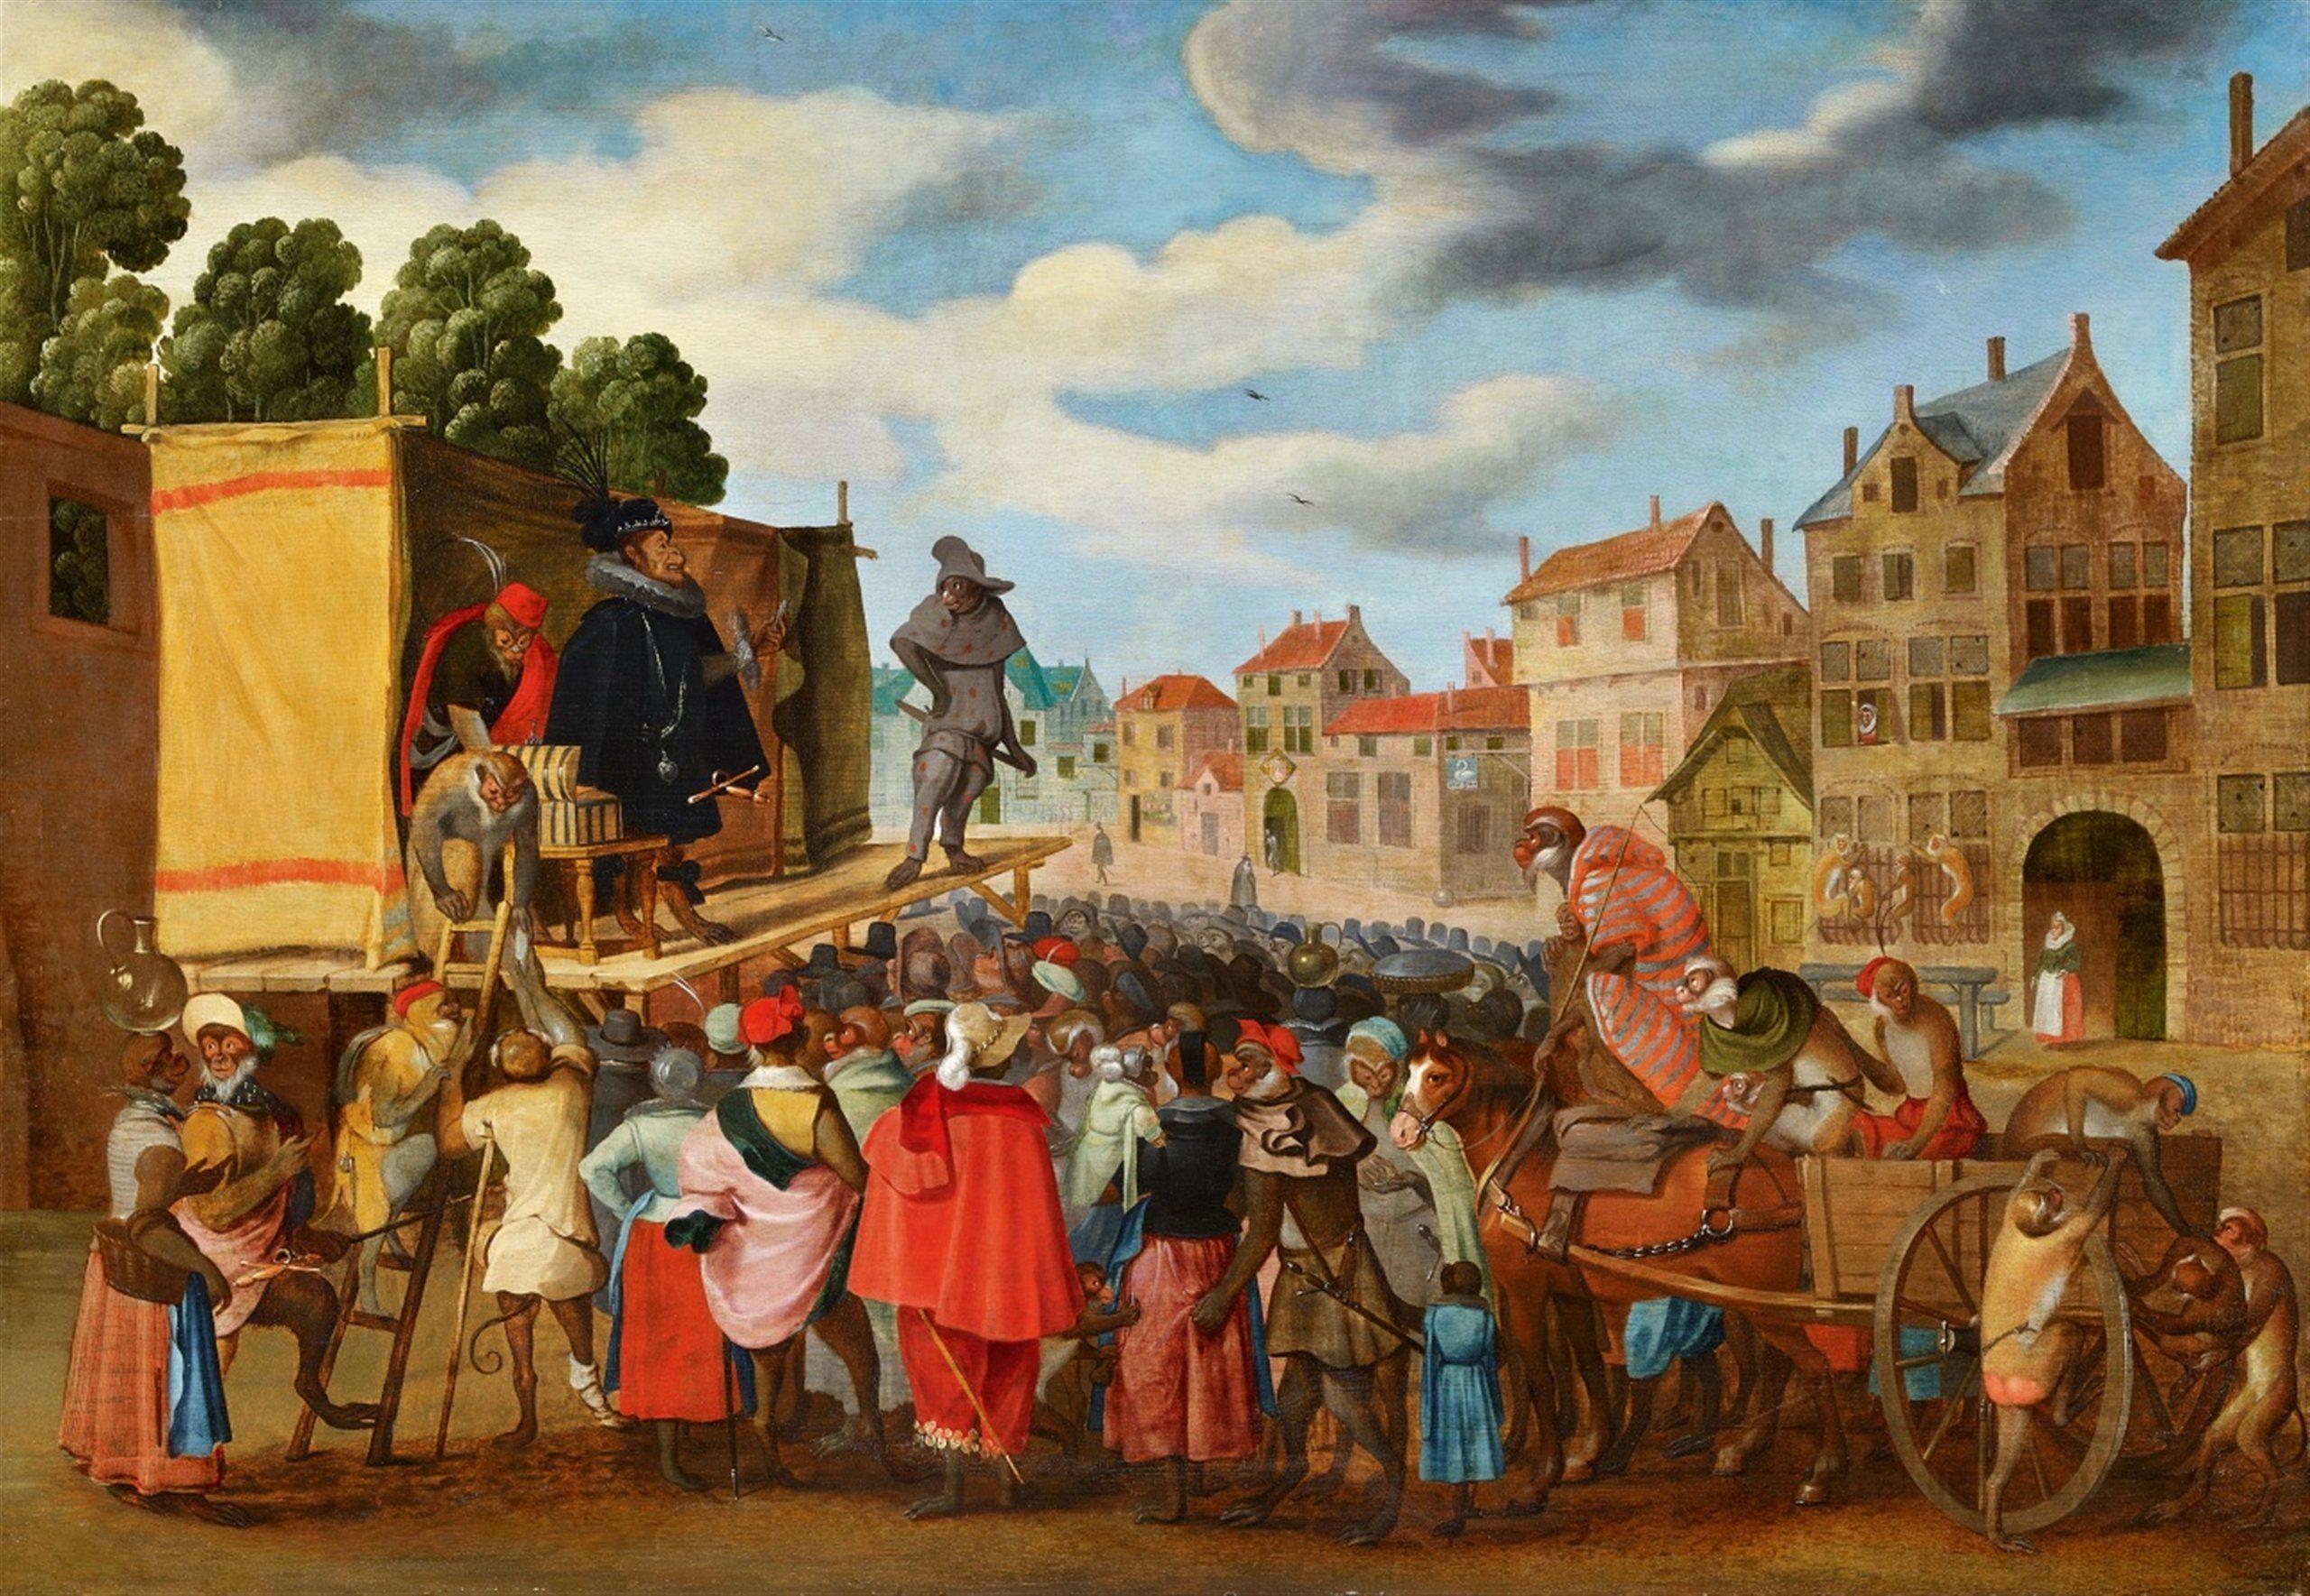 Marktplatz Auktion